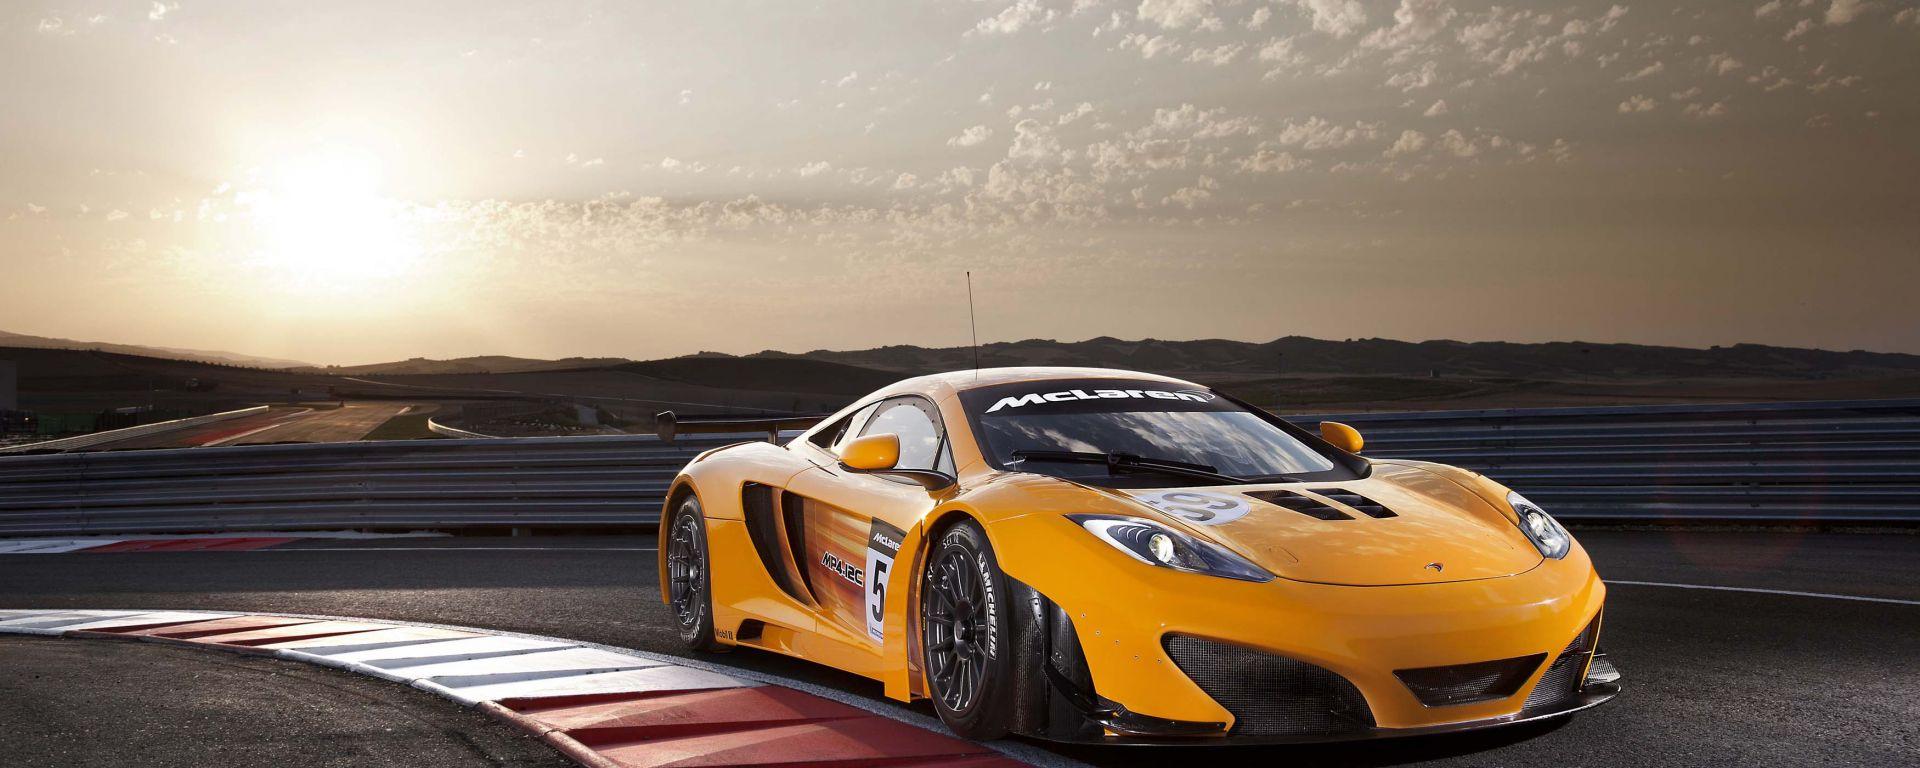 McLaren MP4-12C GT3: 16 nuove spettacolari foto in HD